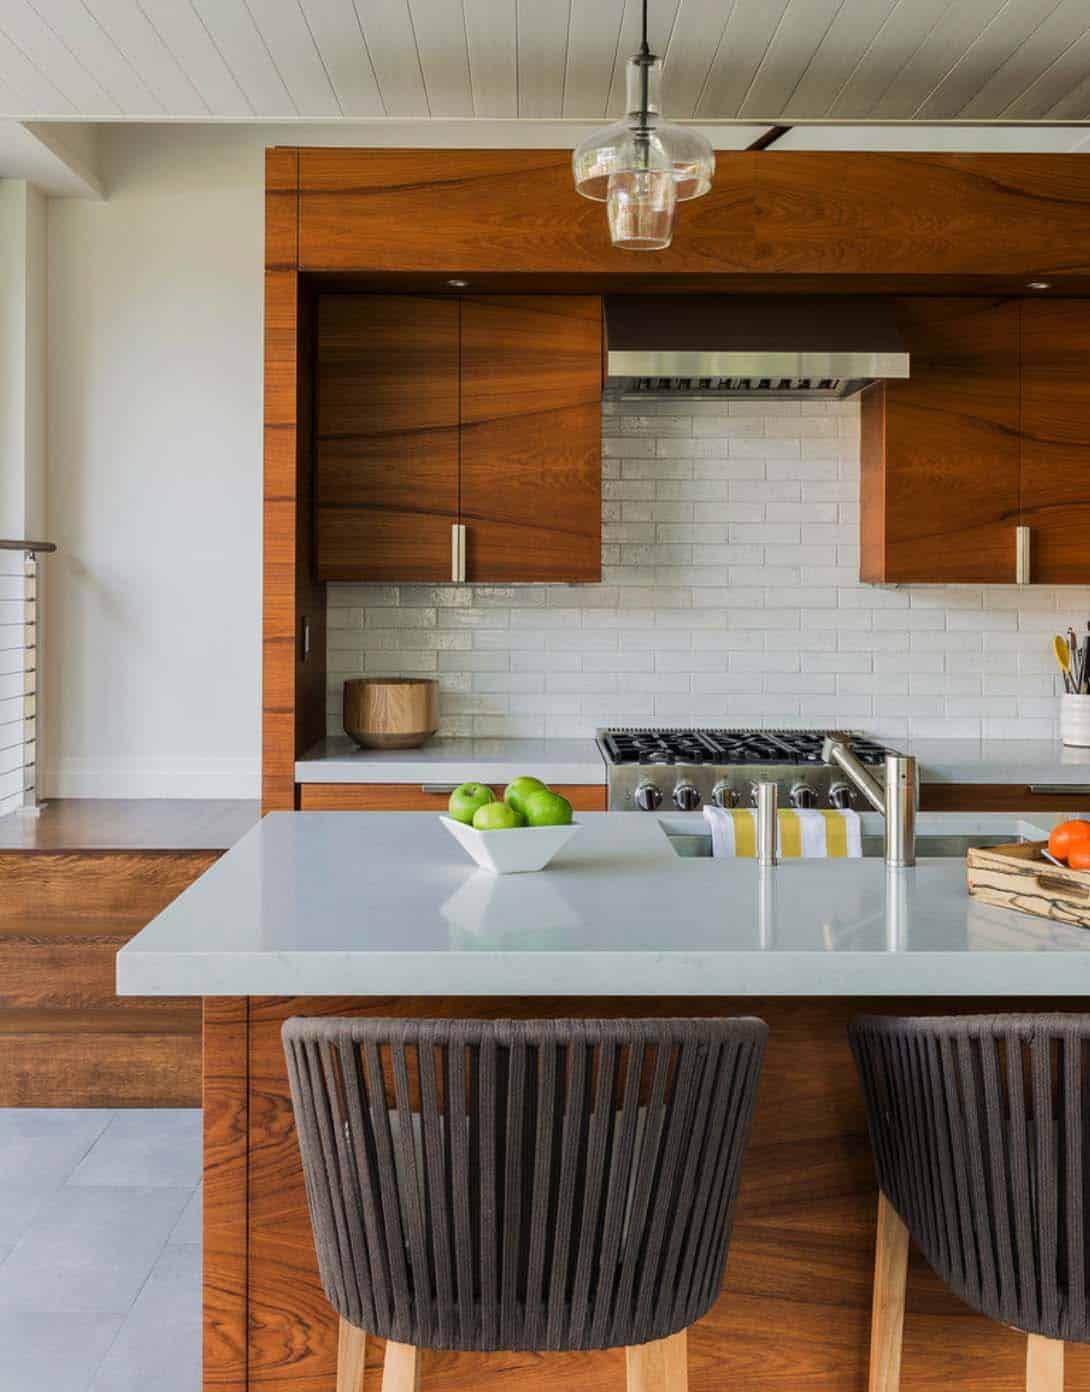 Hilltop Gambrel House-LDa Architecture-26-1 Kindesign